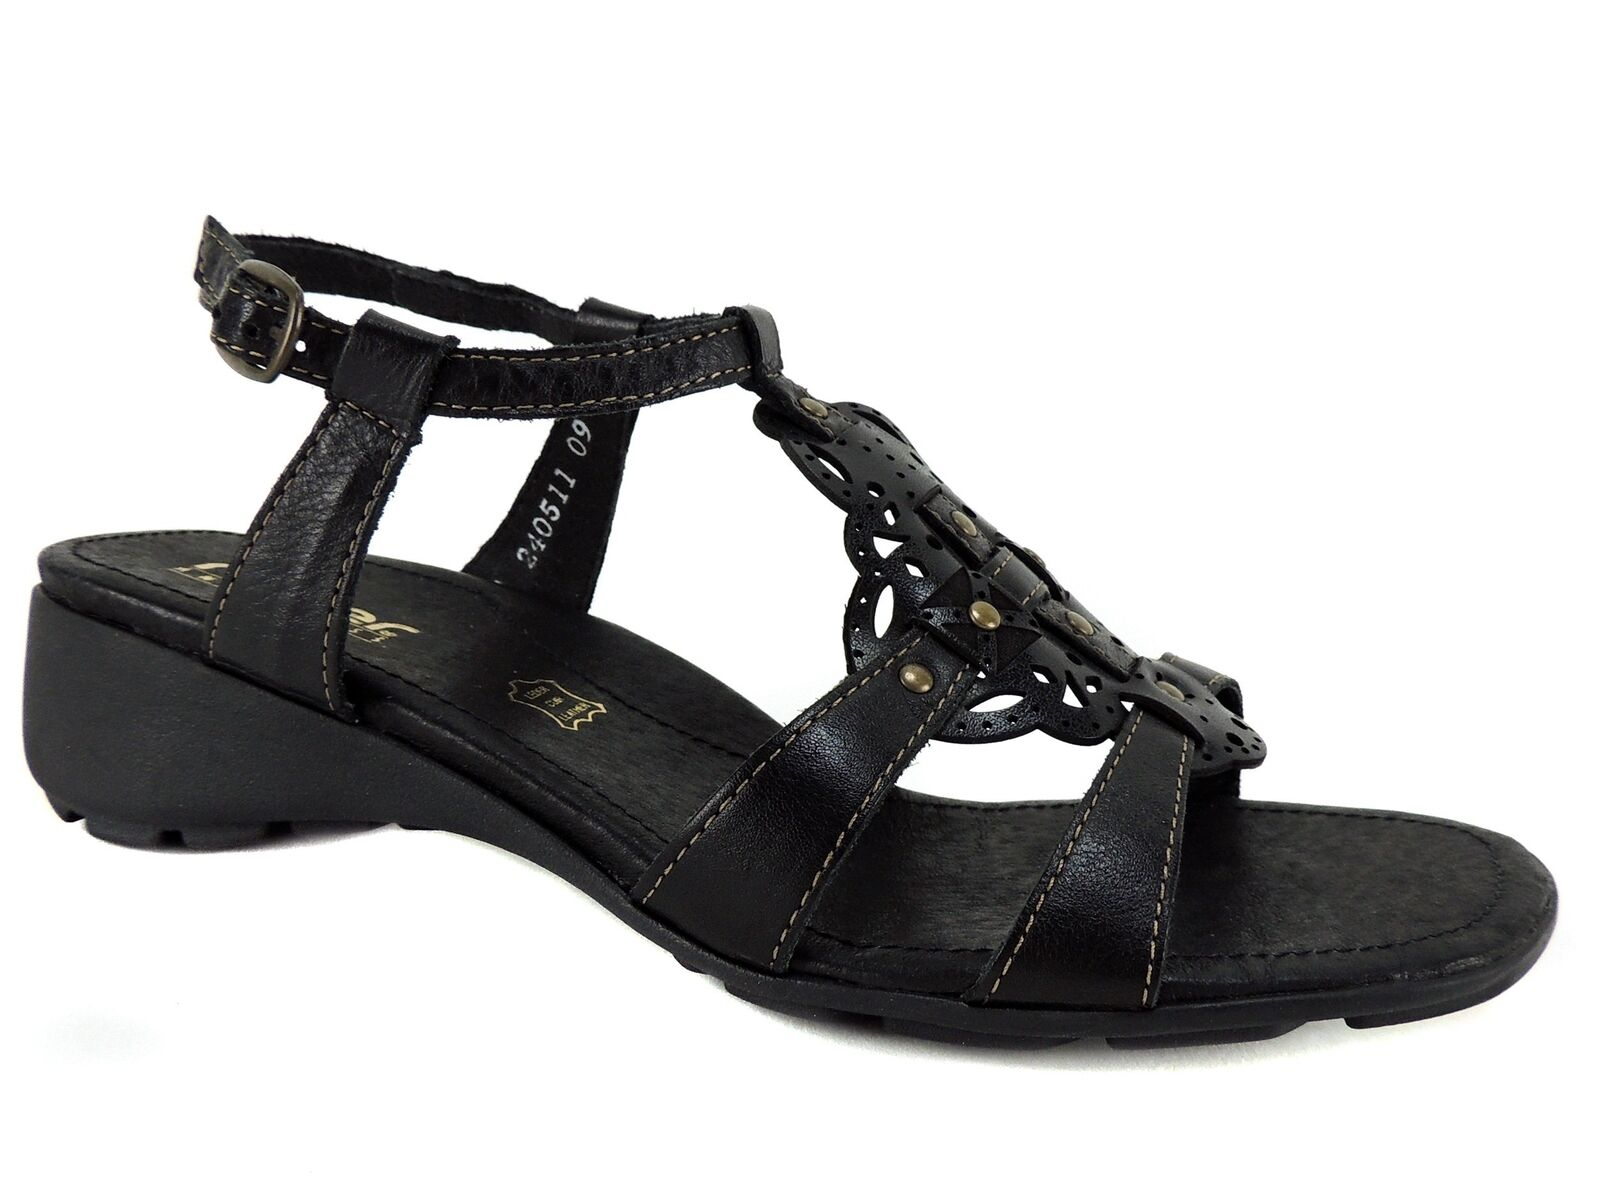 Rockport Women's Cobb Hill Aubrey T Strap Sandals Pewter Leather CBD12PT